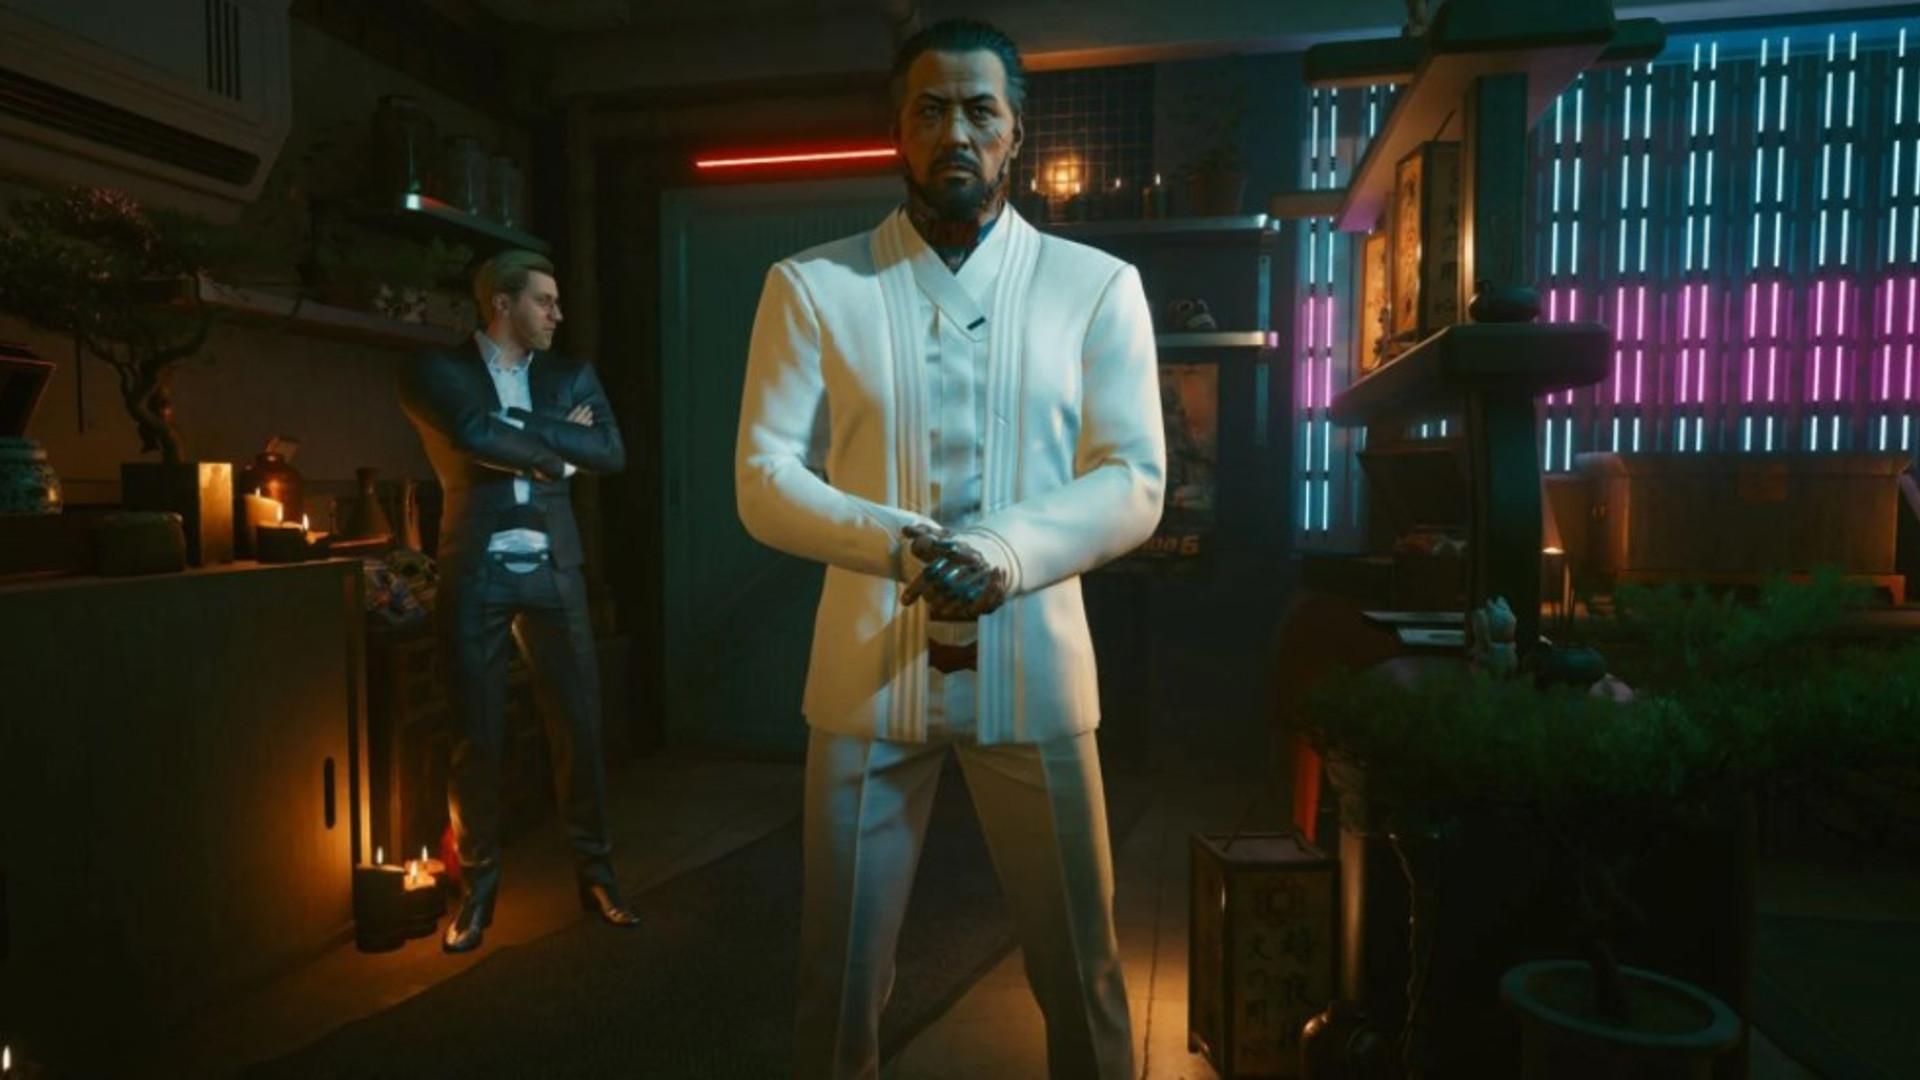 Cyberpunk 2077 game-breaking glitch discovered after latest update